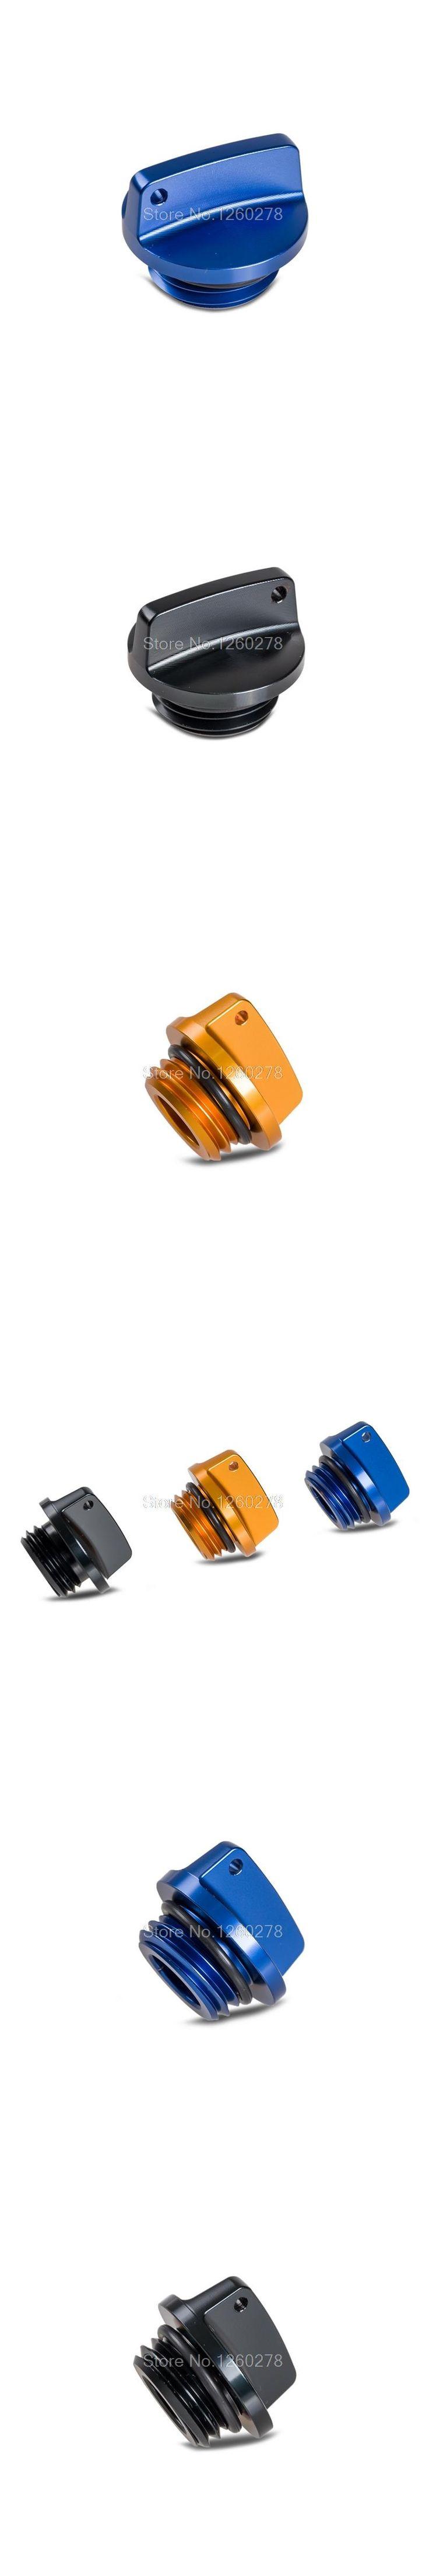 Motorcycle Oil Filler Cap Plug For Yamaha YZF-R1 R6/S R125 600R/750R/1000R XVS650 1100 1300 XT660X XV950 FZ1 FZ6 FZR750 MT07 TDM